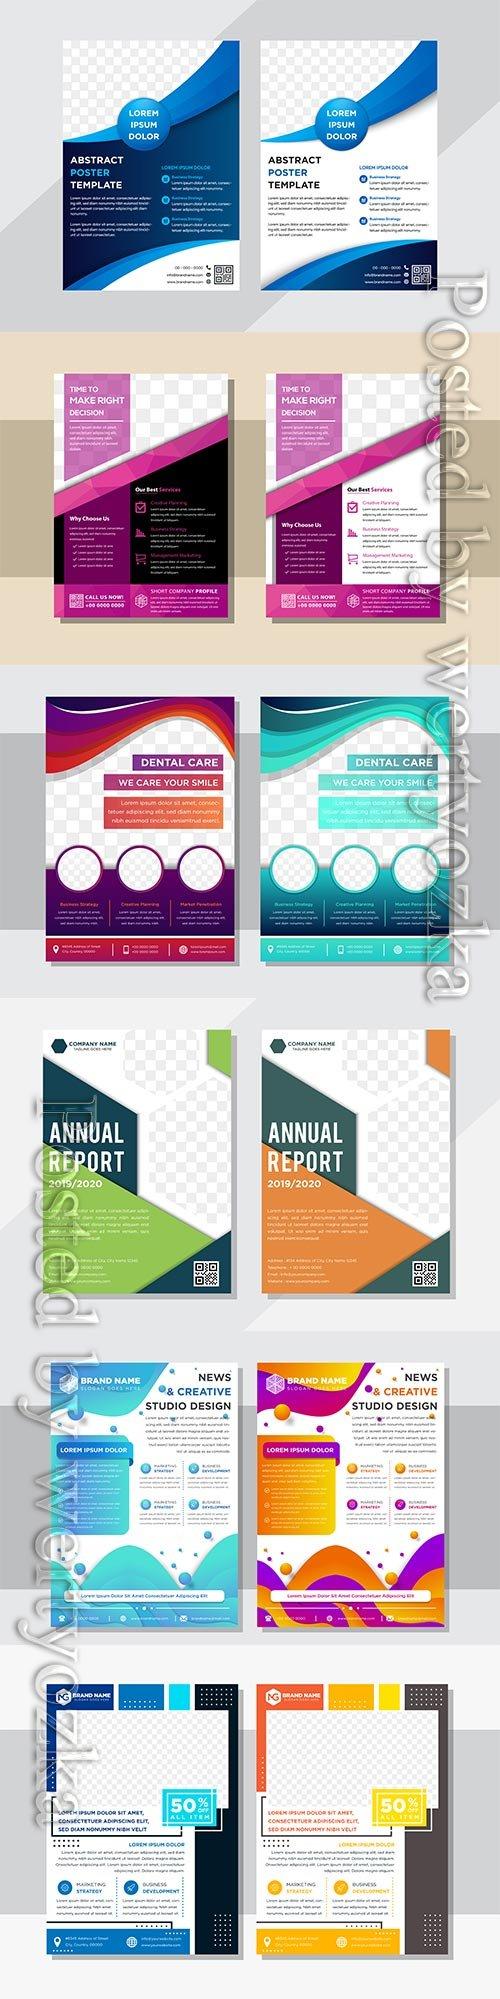 Business flyer template design, brochure vector illustration # 3